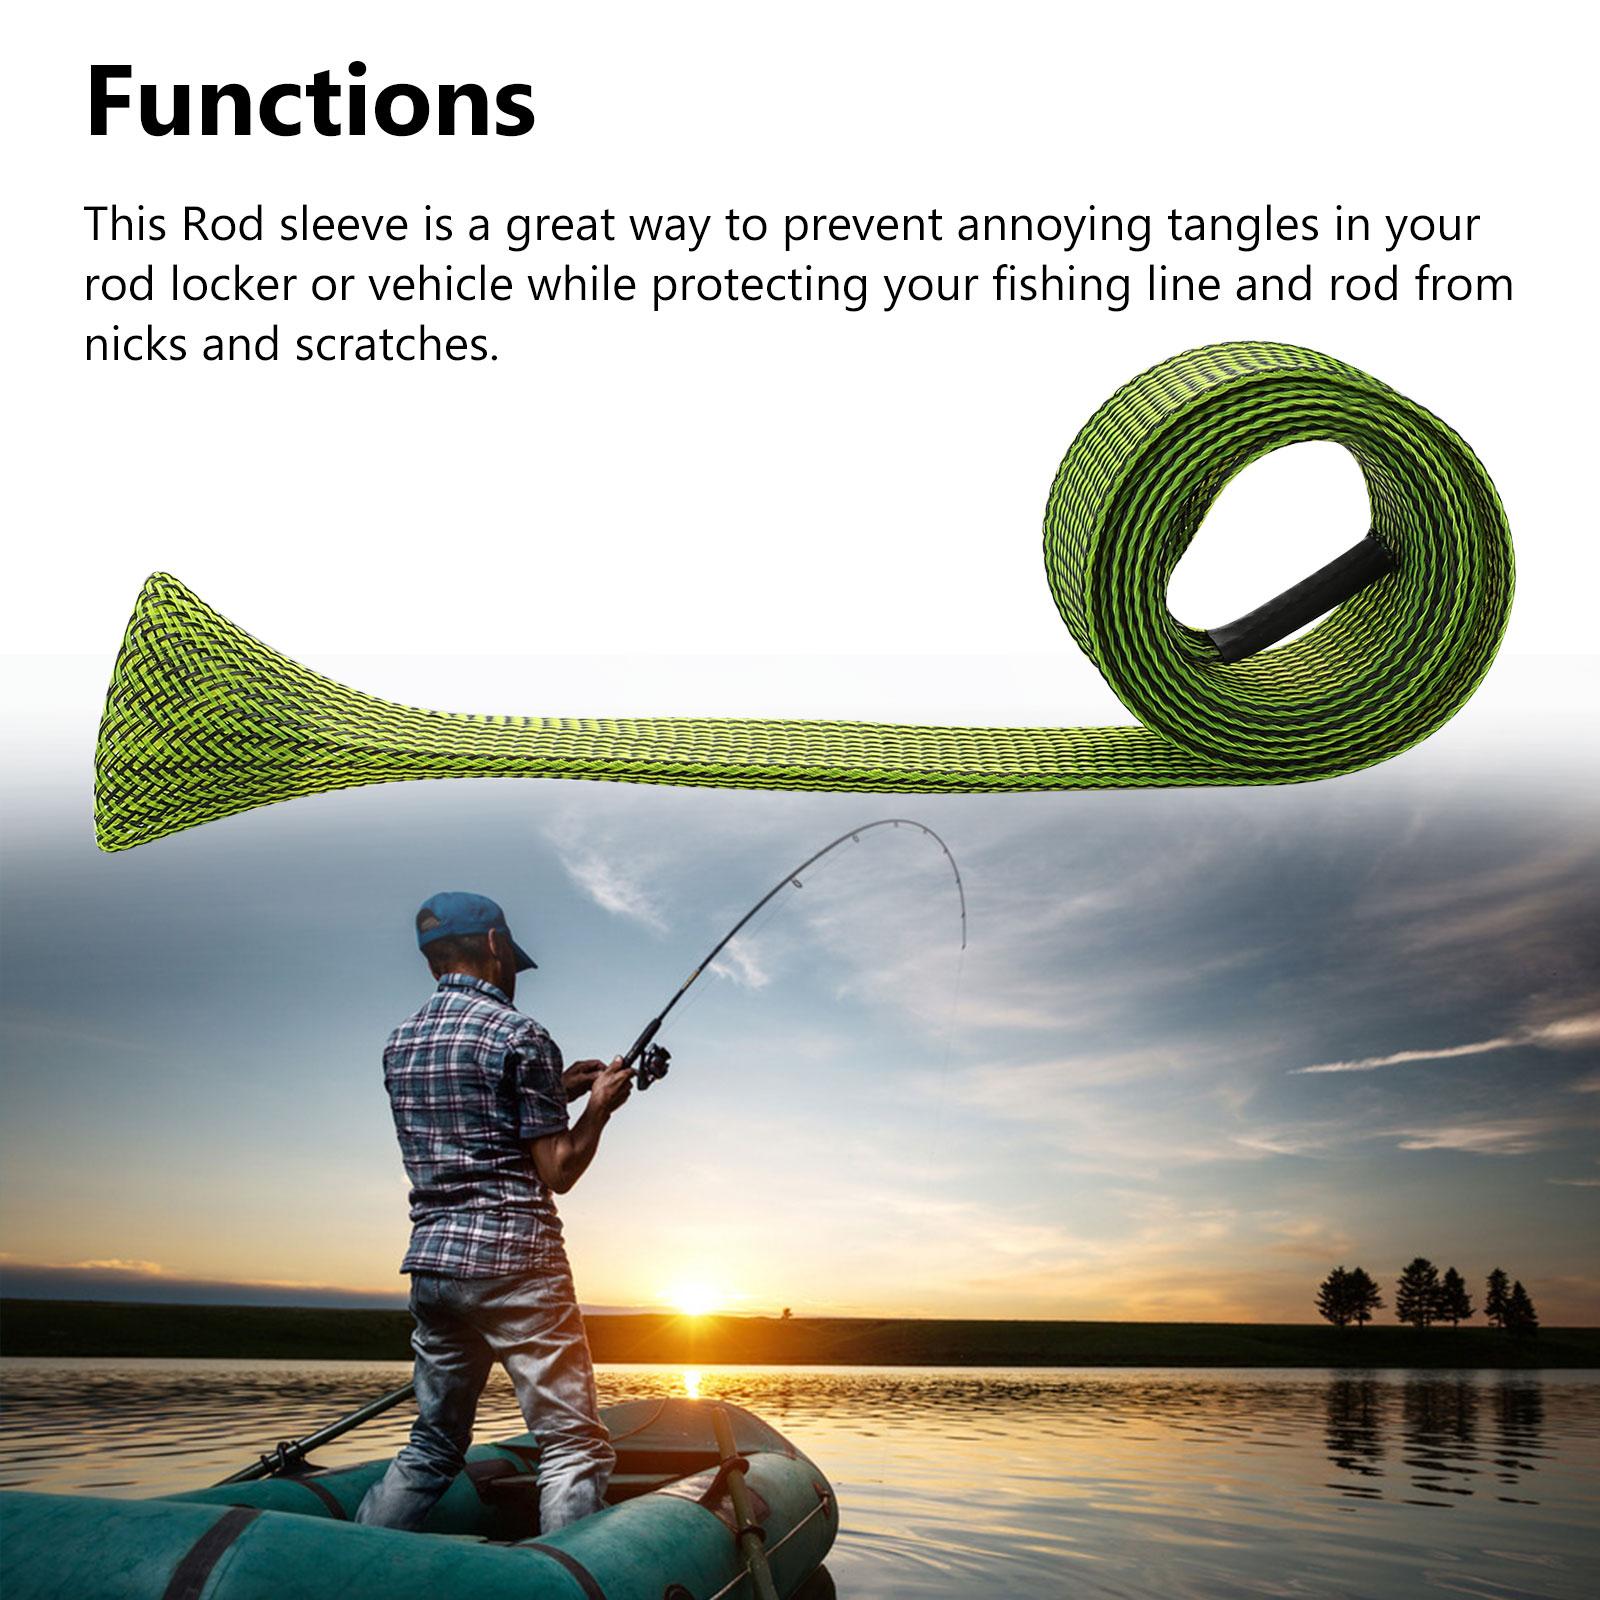 10Pcs-67-039-039-Fishing-Spinning-Rod-Sock-Covers-Braided-Mesh-Rod-Protector-Sleeve-US thumbnail 7